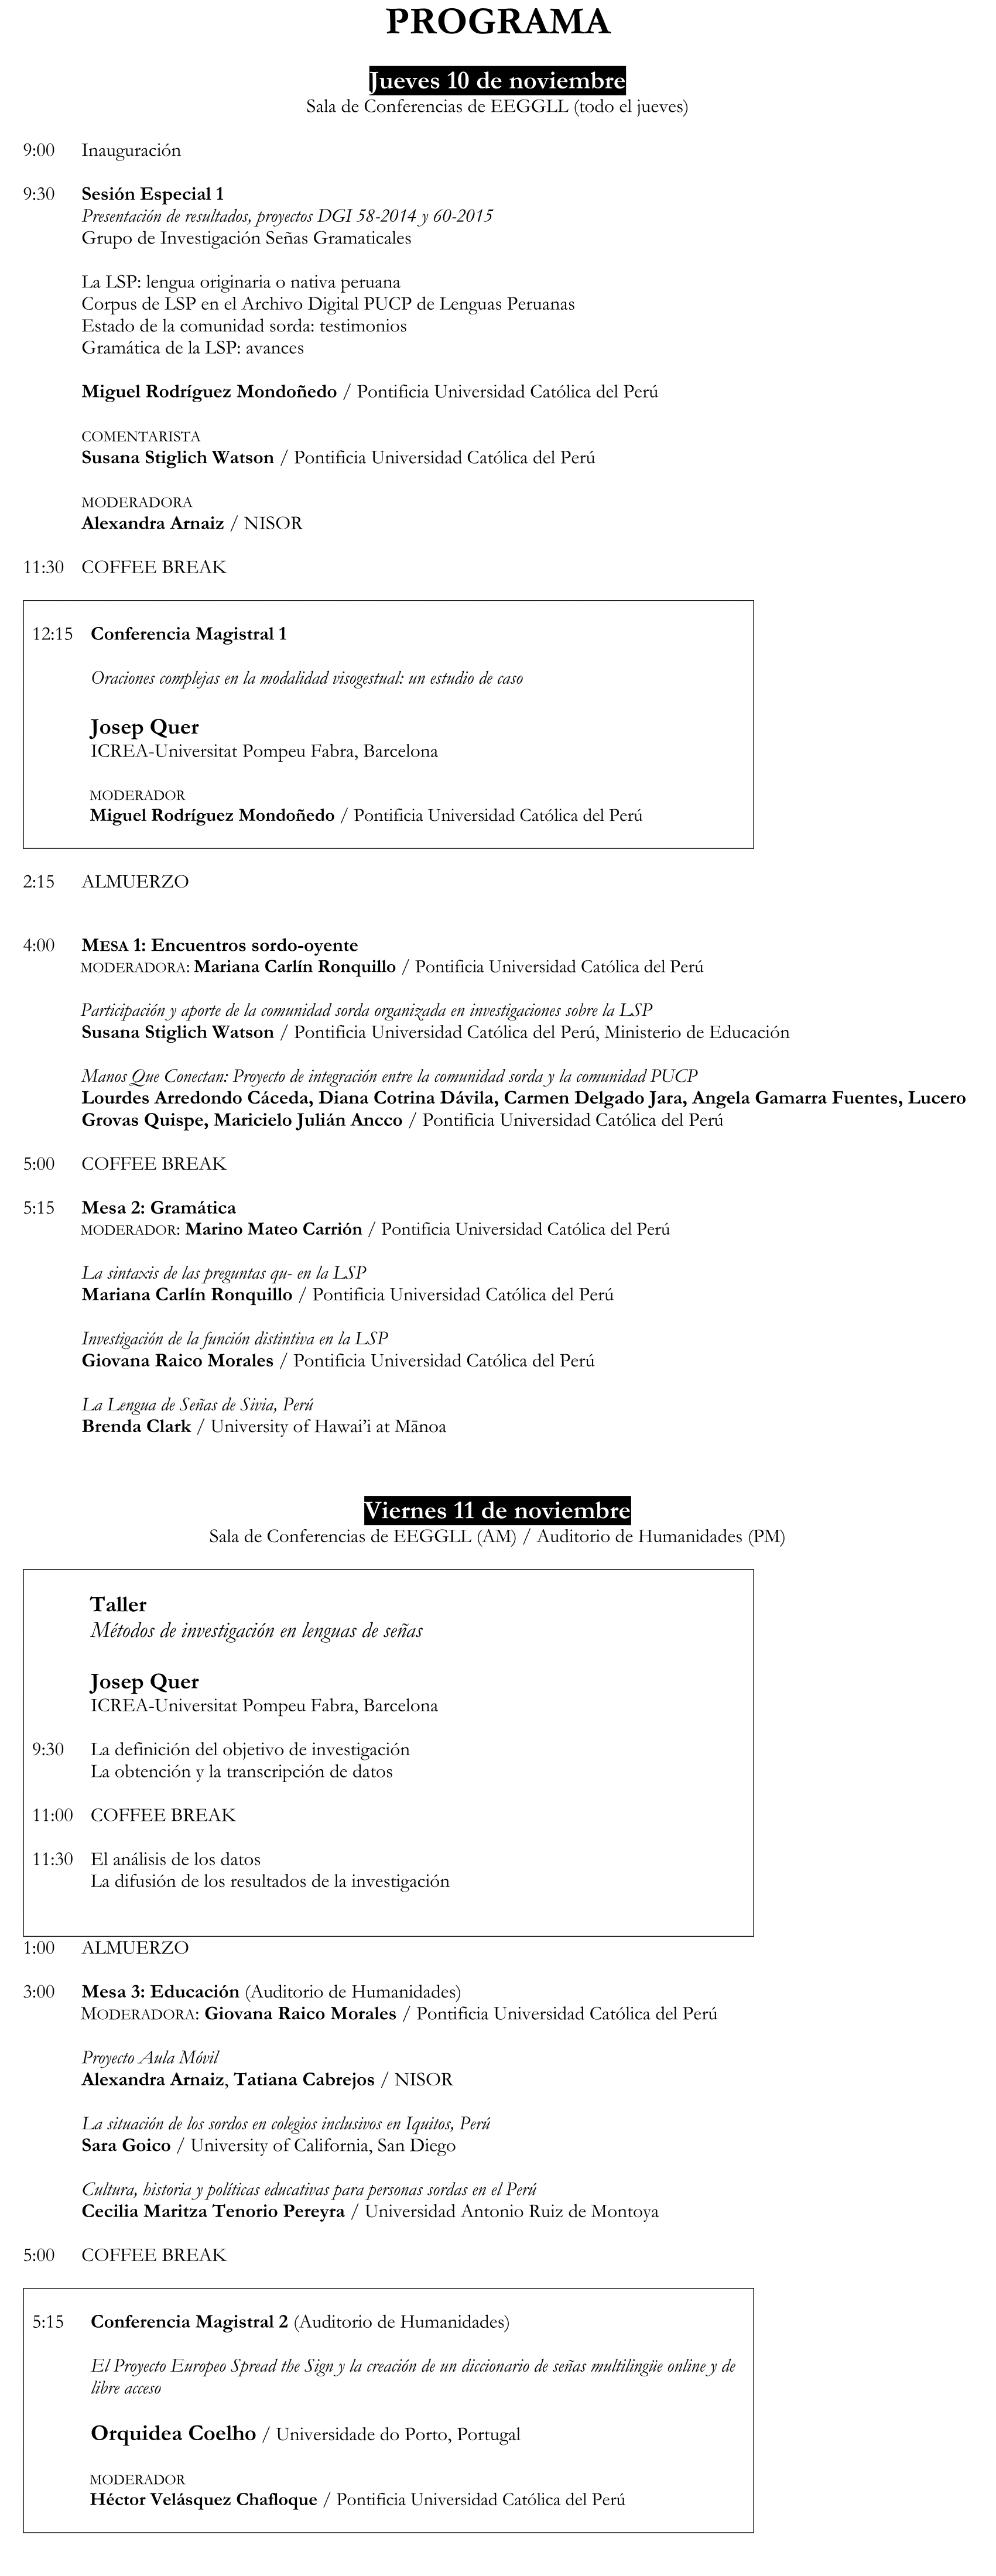 programasimple-uno-1